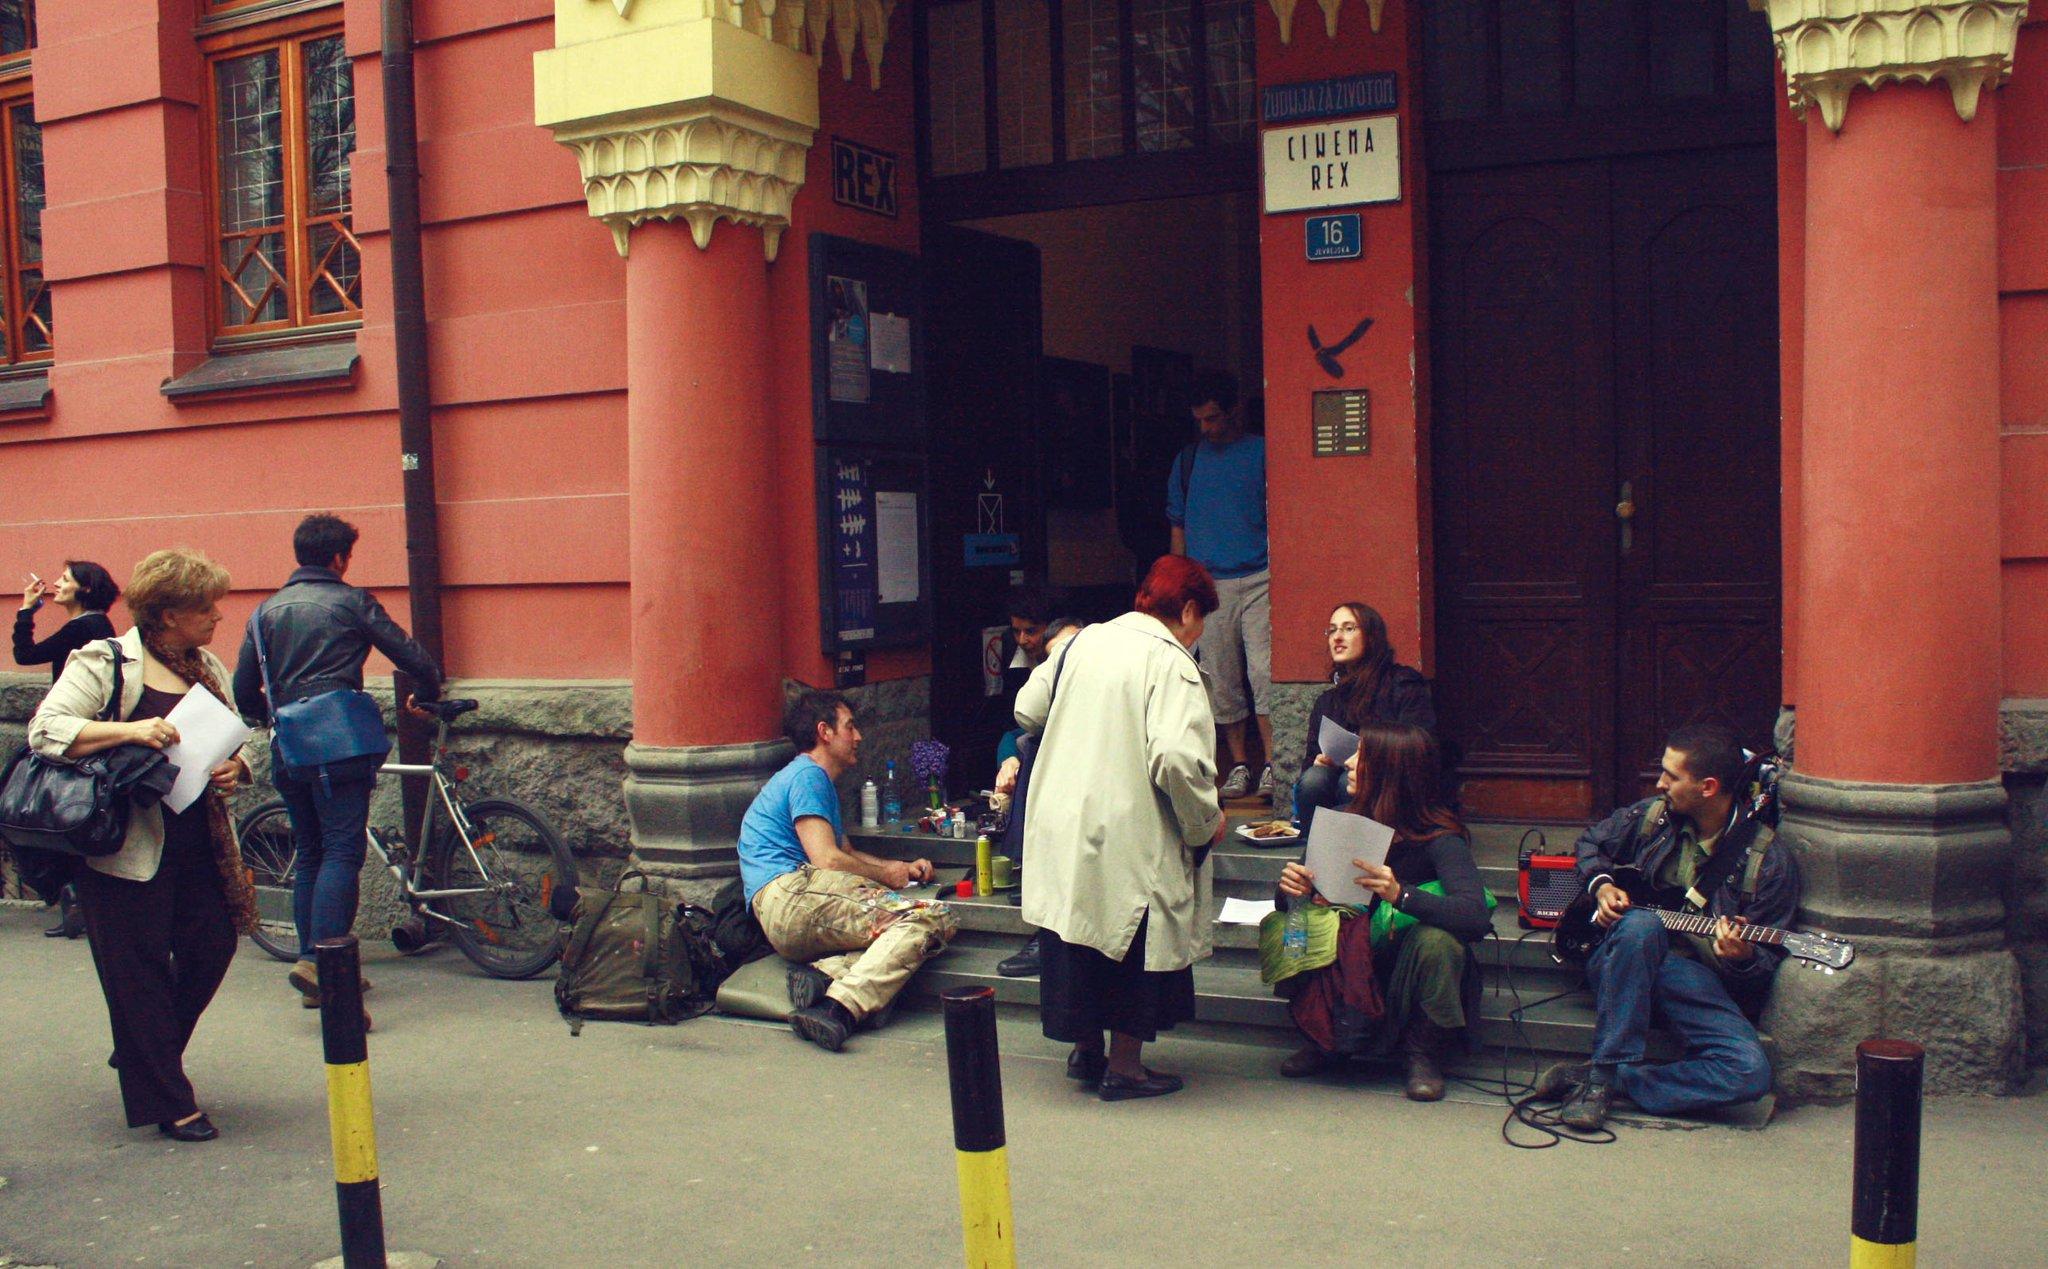 Ispred ulaza u Rex; Kulturni centar REX / Facebook